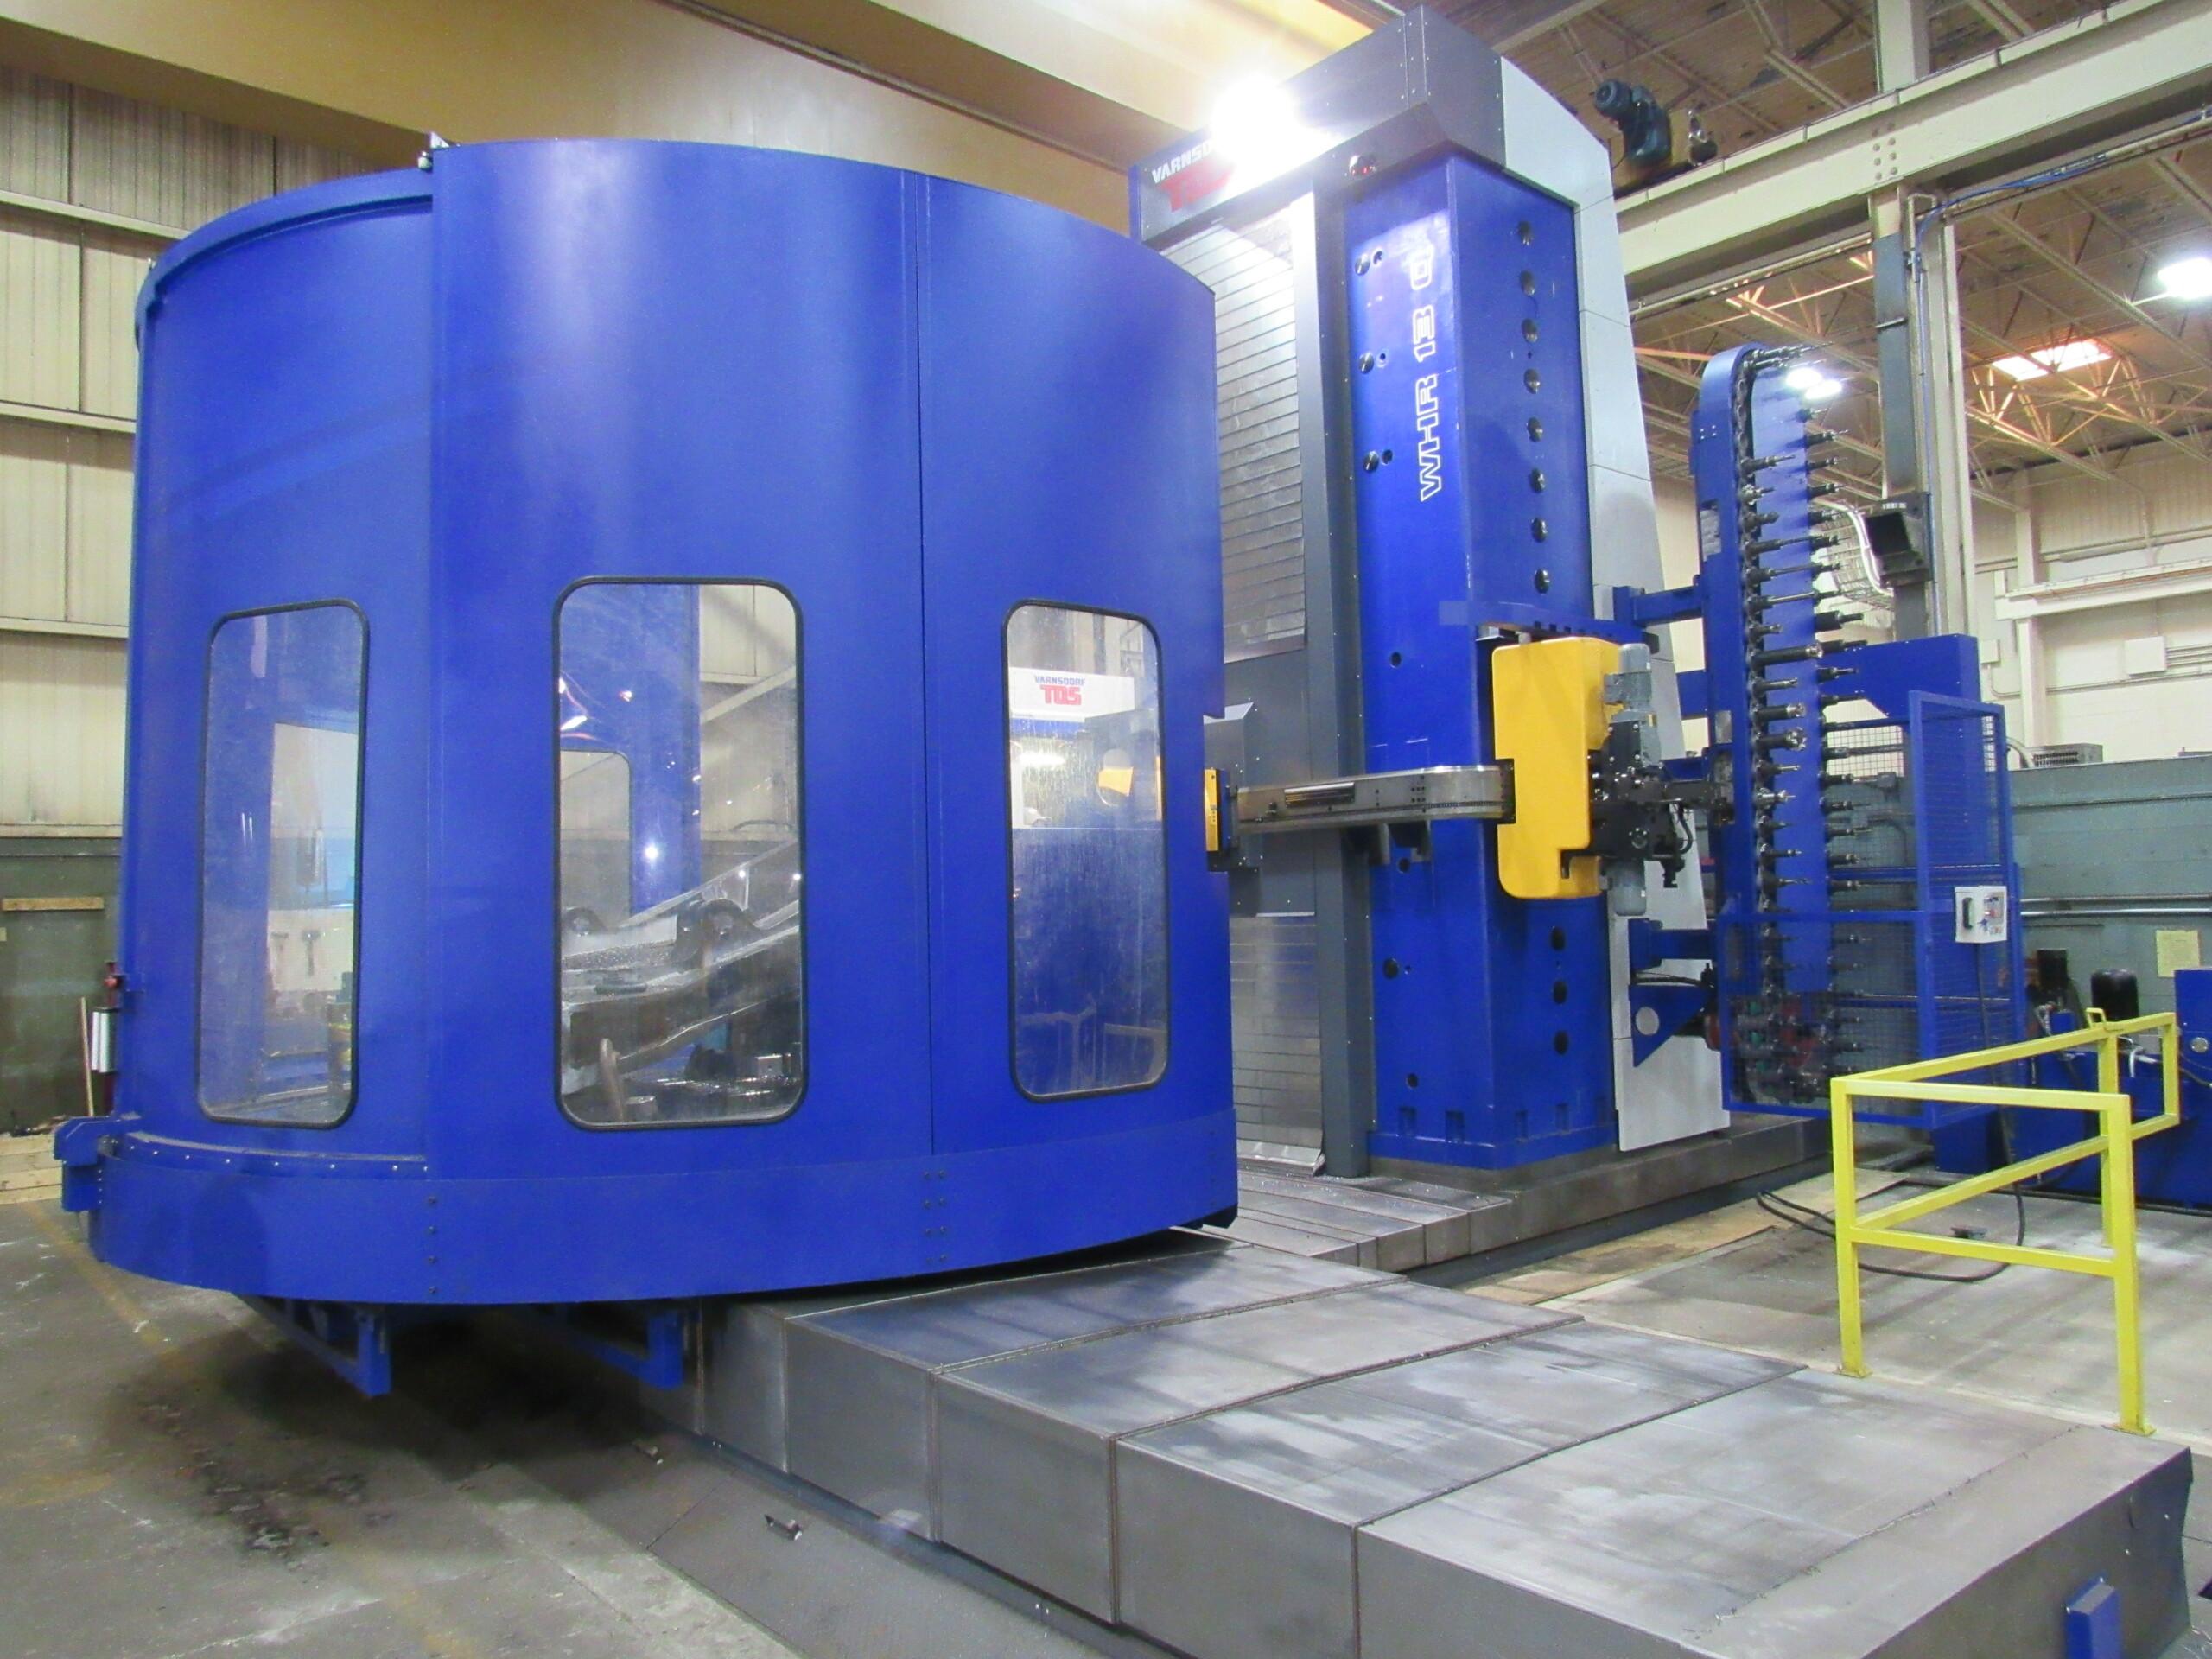 Large Blue CNC Machine